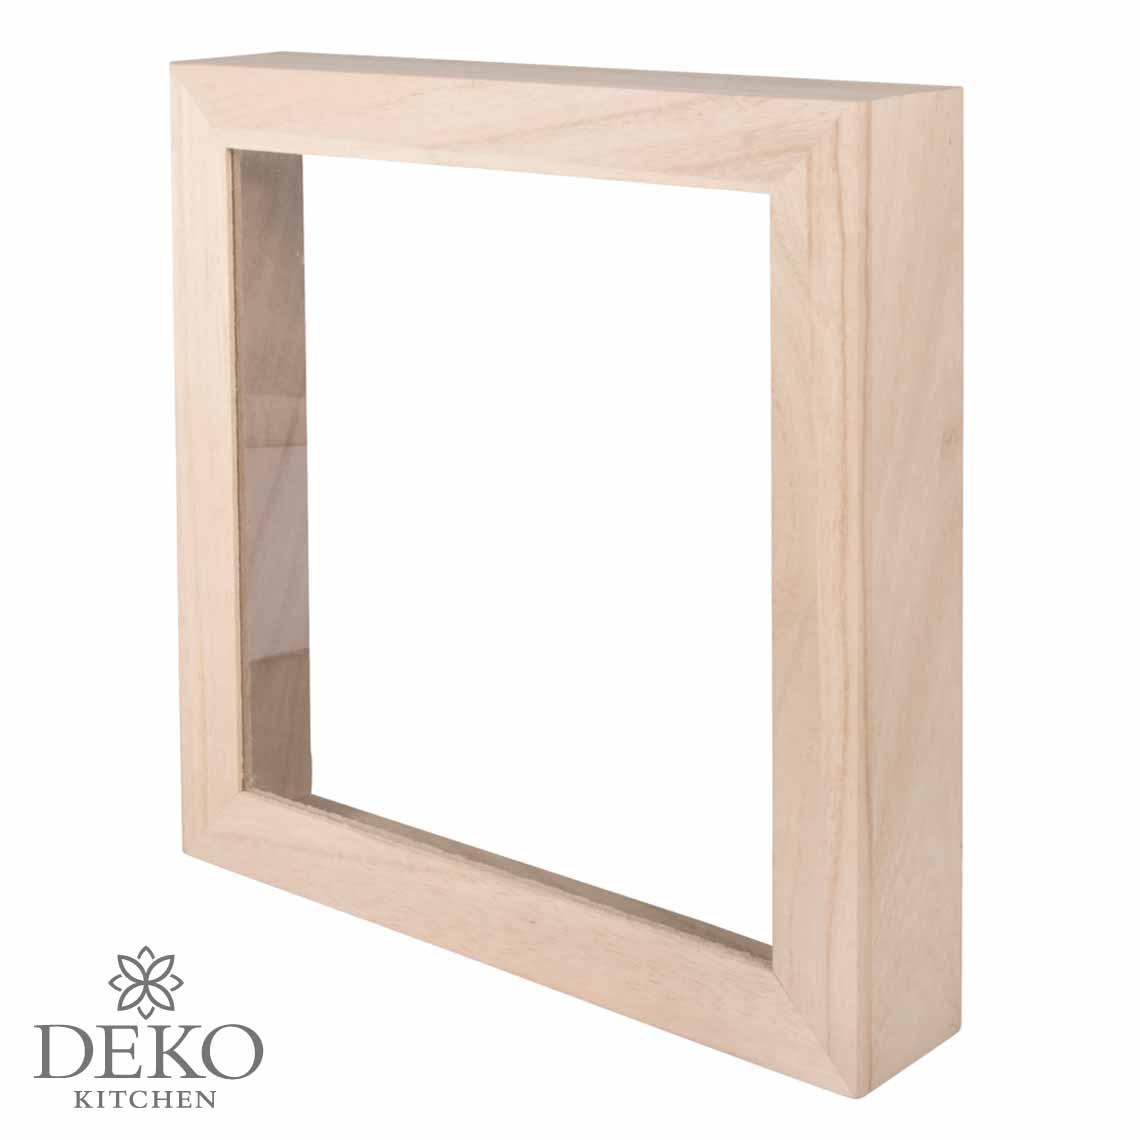 Holz-Rahmen 24 x 24cm mit Acrylglas | Deko Kitchen Shop